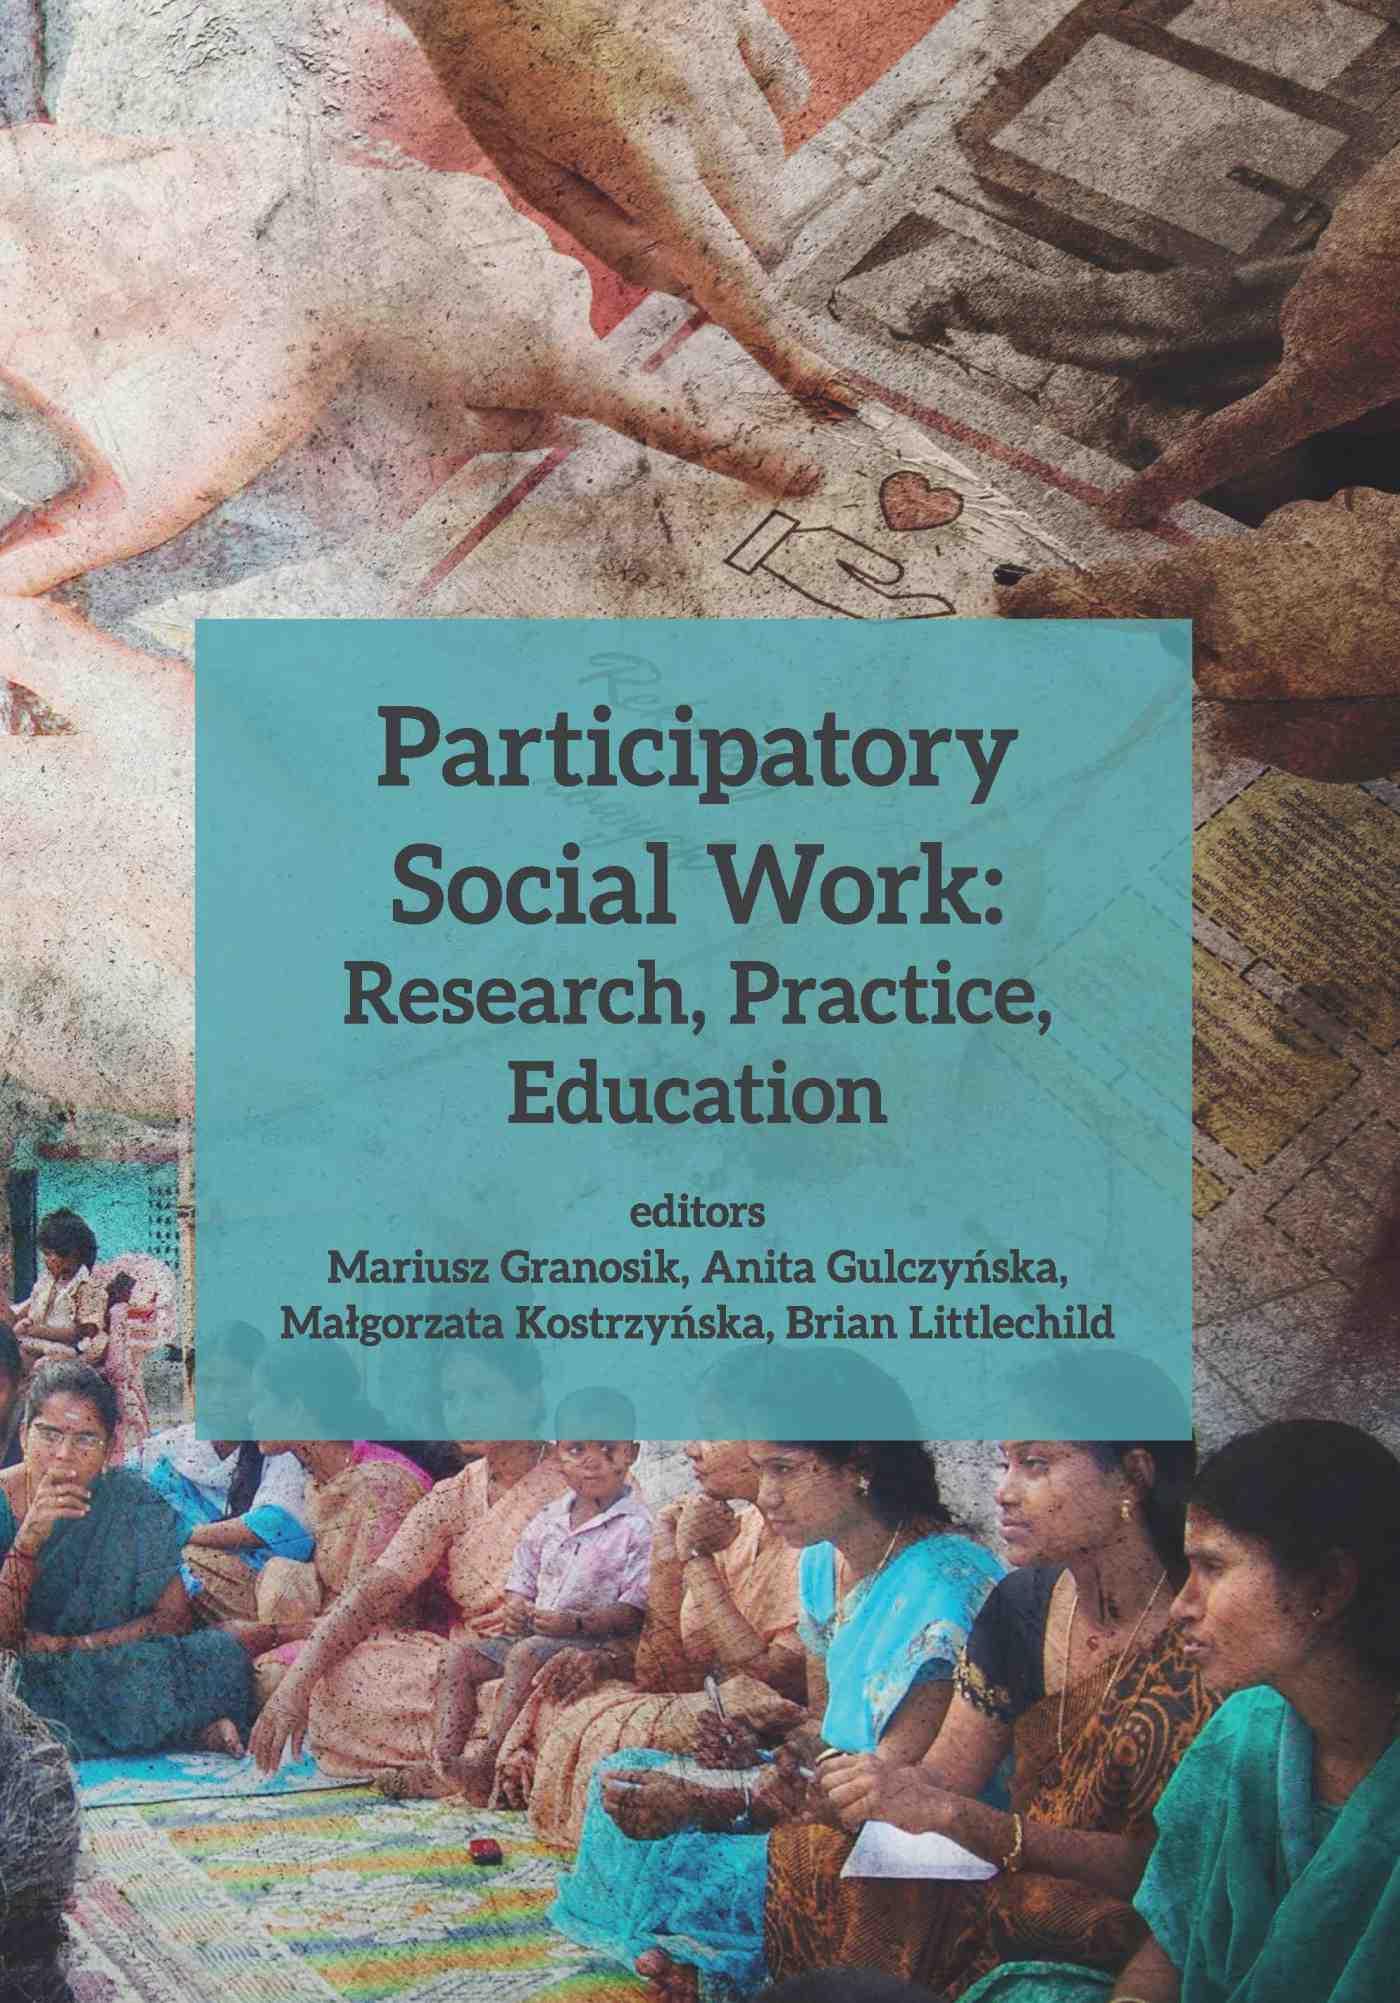 Participatory Social Work: Research, Practice, Education - Ebook (Książka PDF) do pobrania w formacie PDF